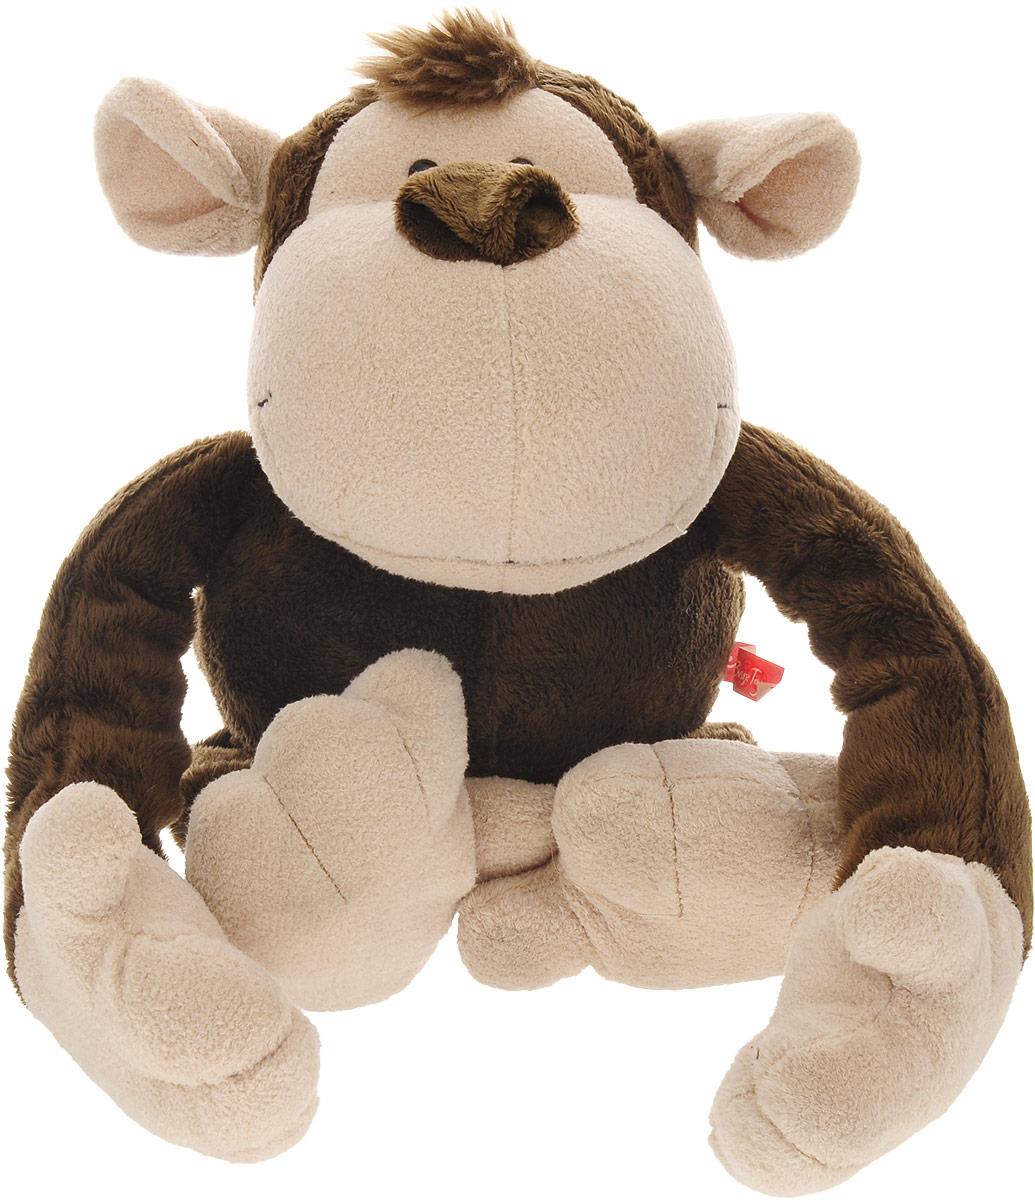 Magic Bear Toys Мягкая игрушка Обезьяна Михей 35 см мягкая игрушка magic bear toys тигр 60 см